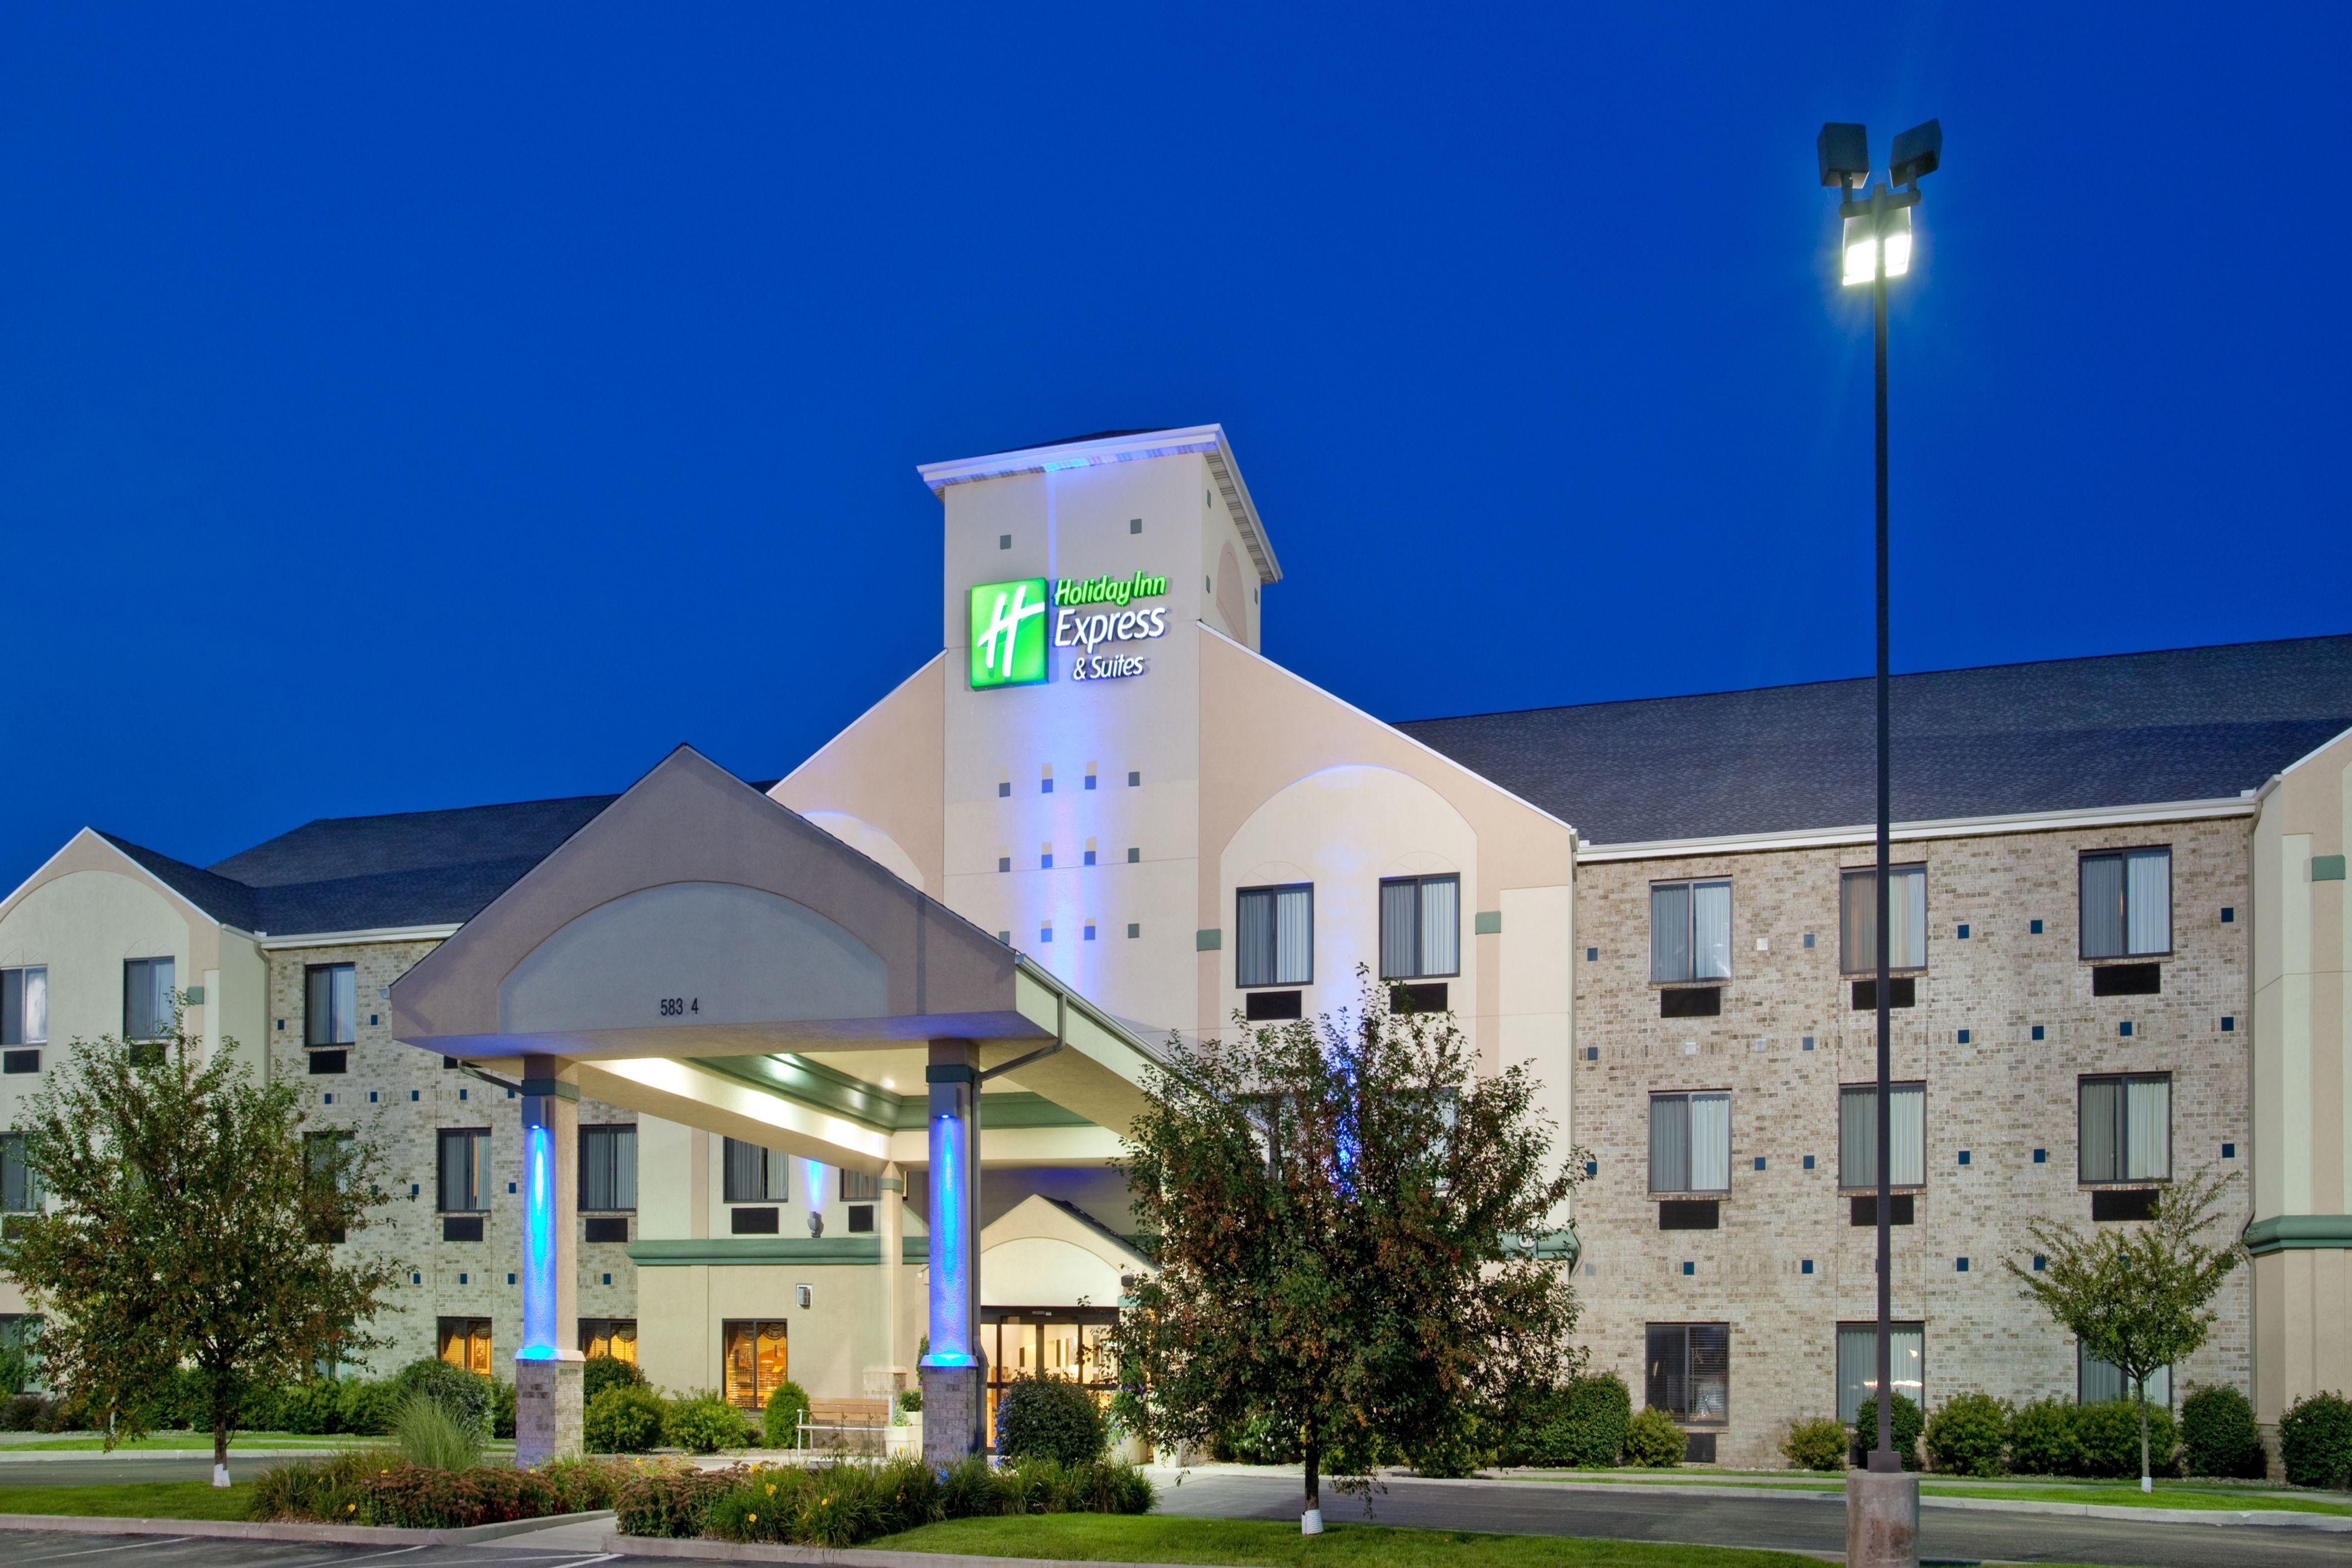 Holiday inn express suites elk grove ctrl sacramento s - Hilton garden inn elkhart indiana ...